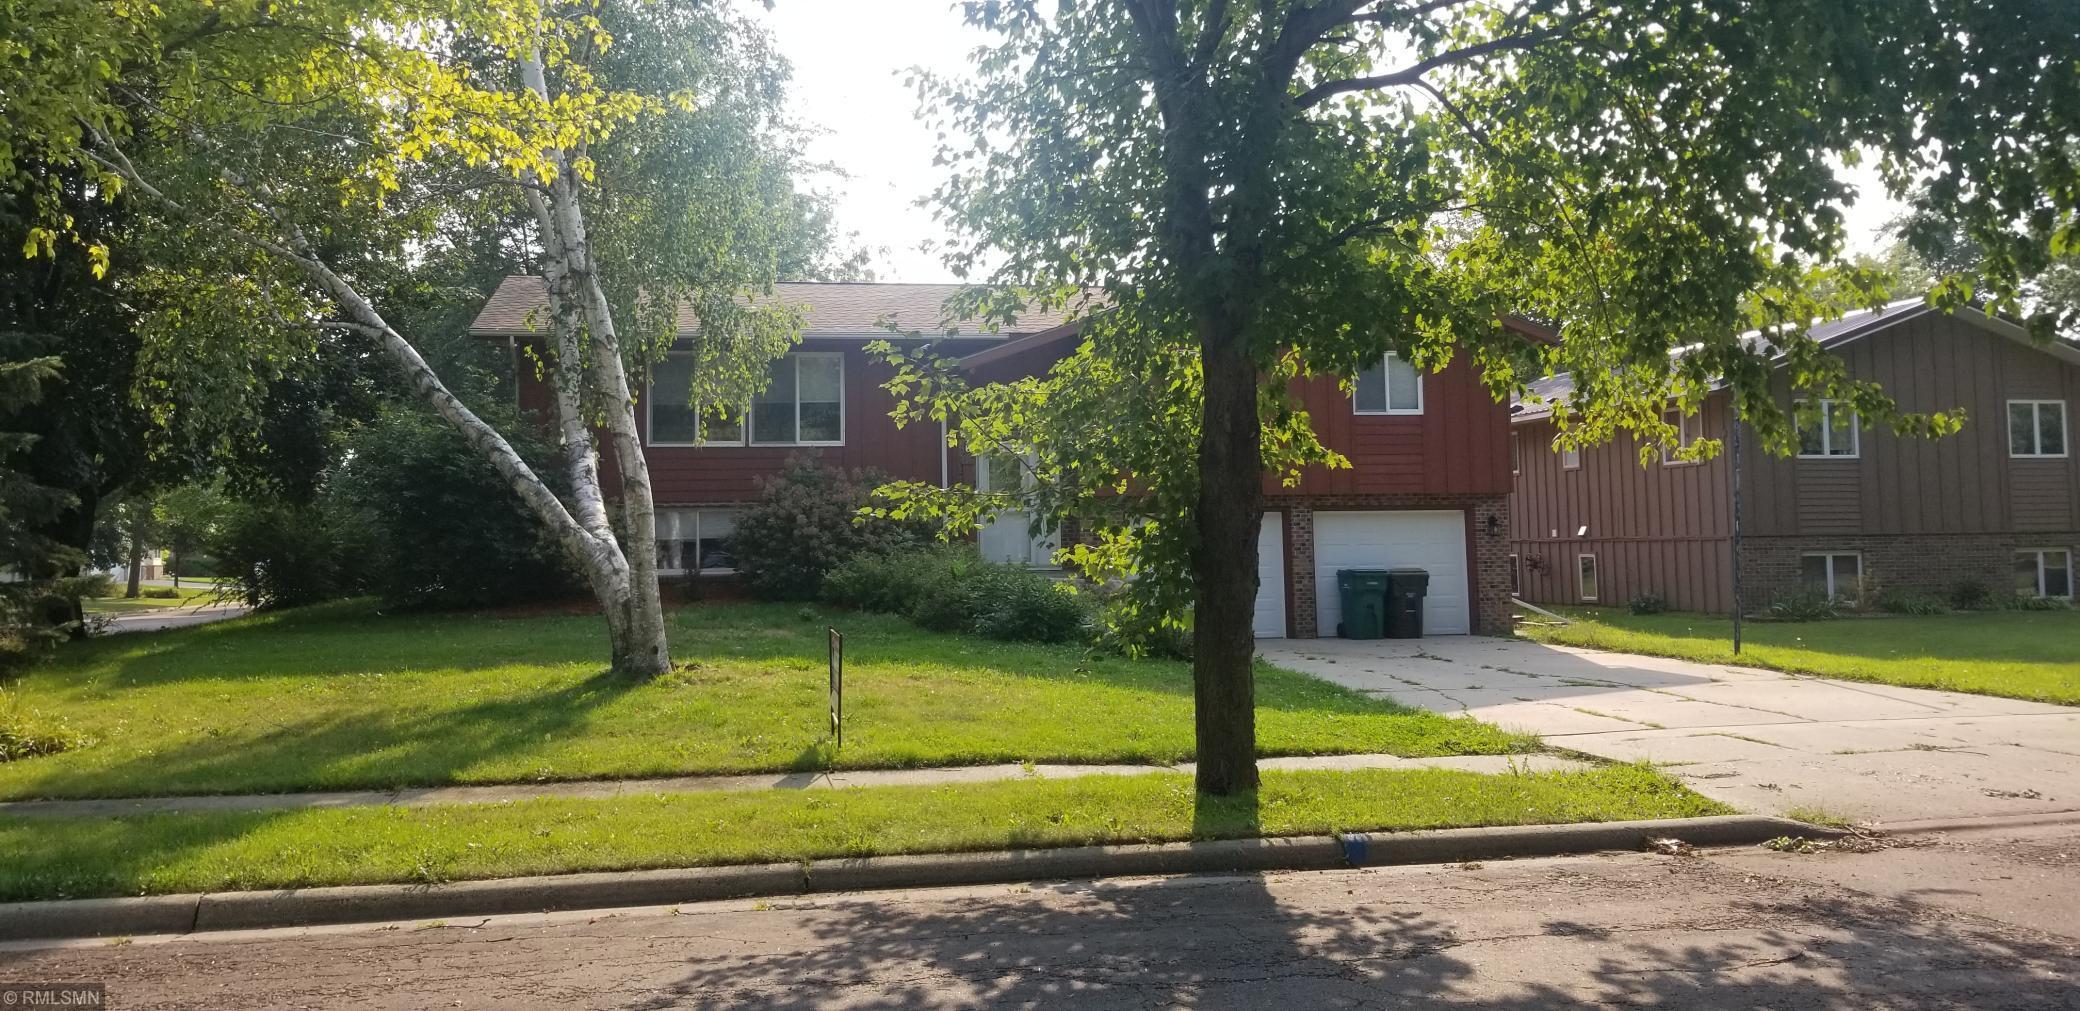 1816 Judd Avenue N Property Photo - Glencoe, MN real estate listing